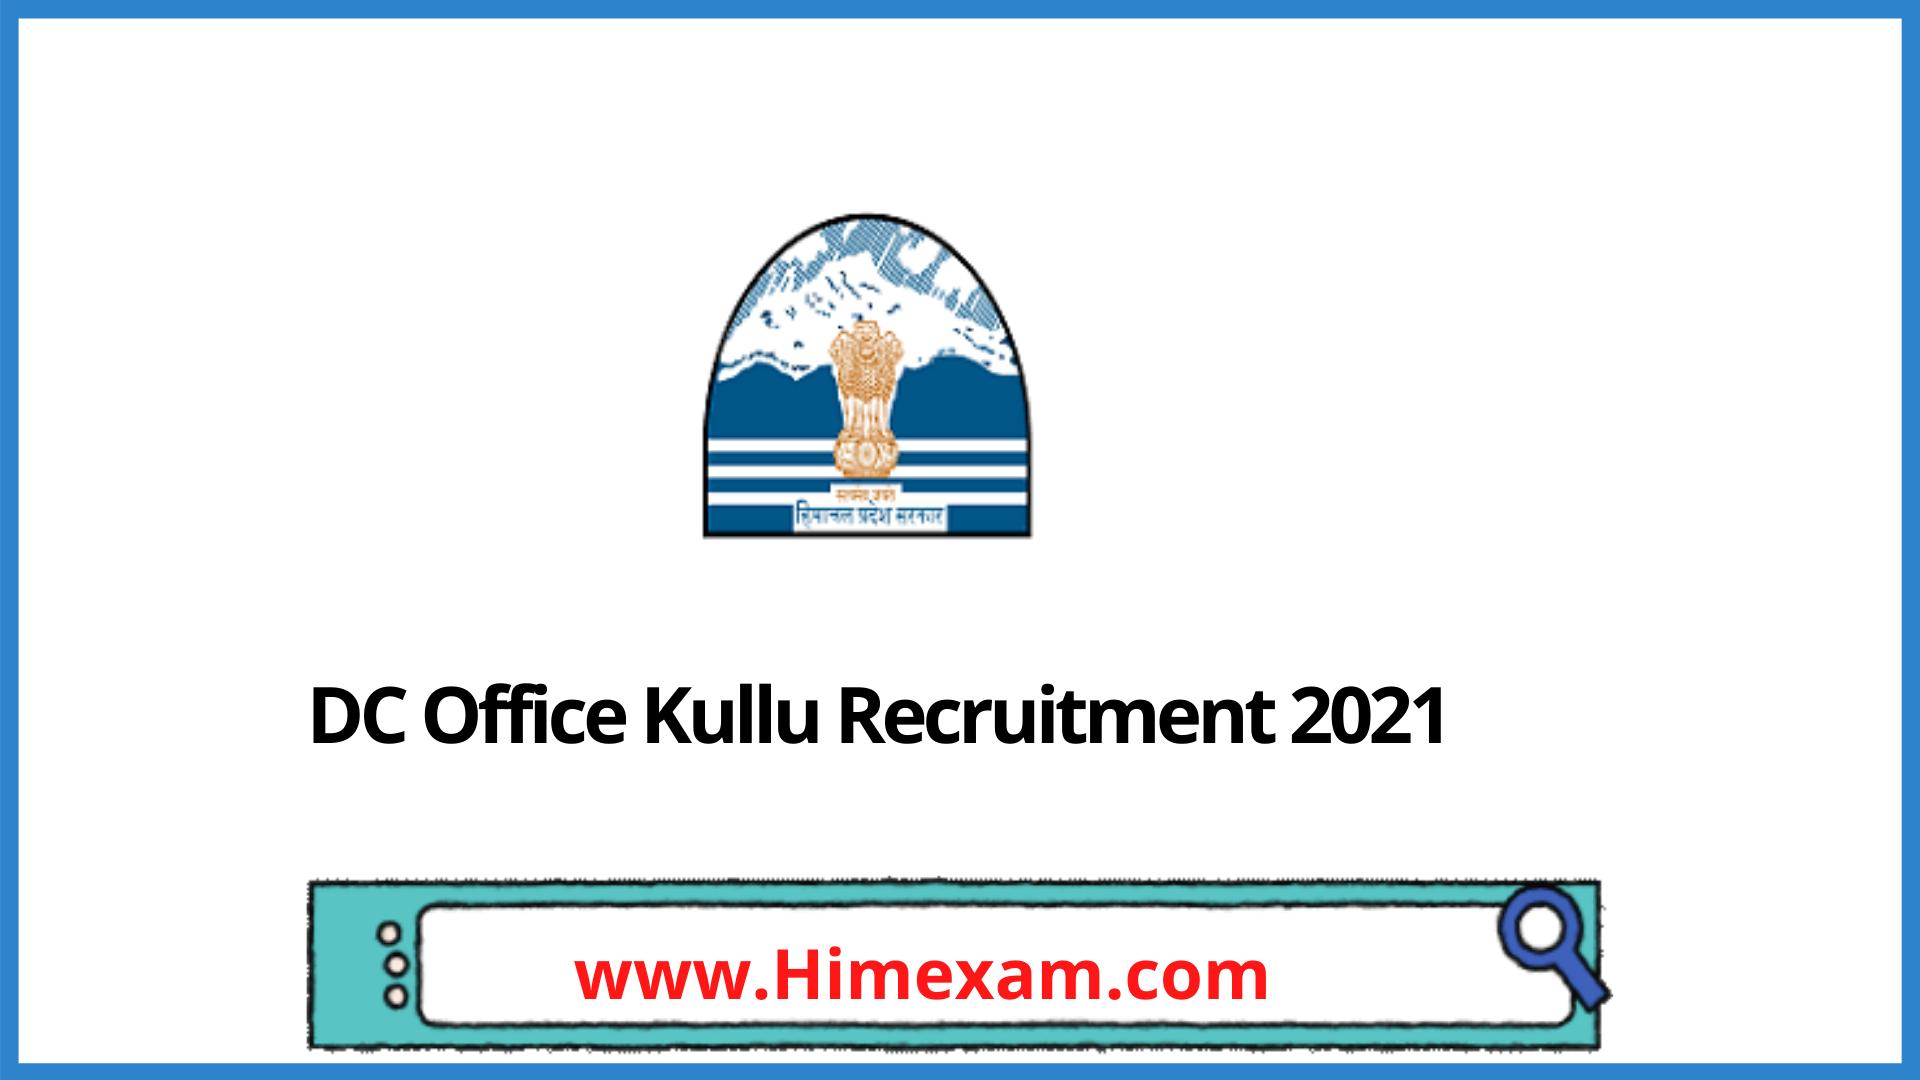 DC Office Kullu Recruitment 2021